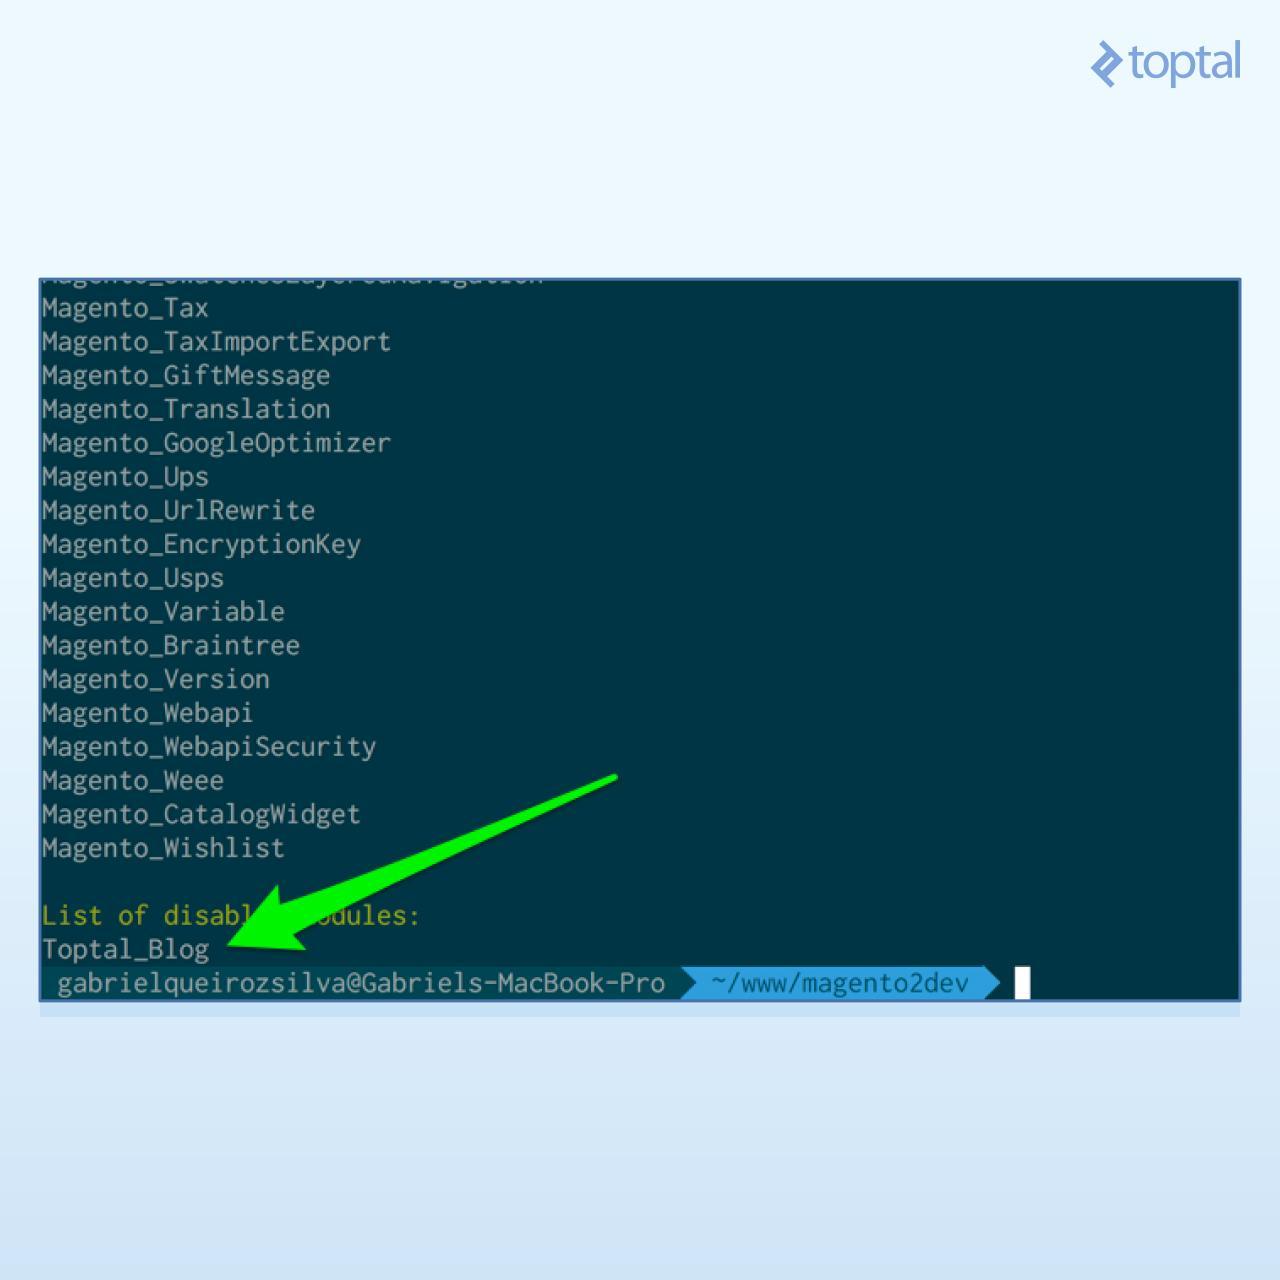 Magento 2 Tutorial: Building a Complete Module - Image 21